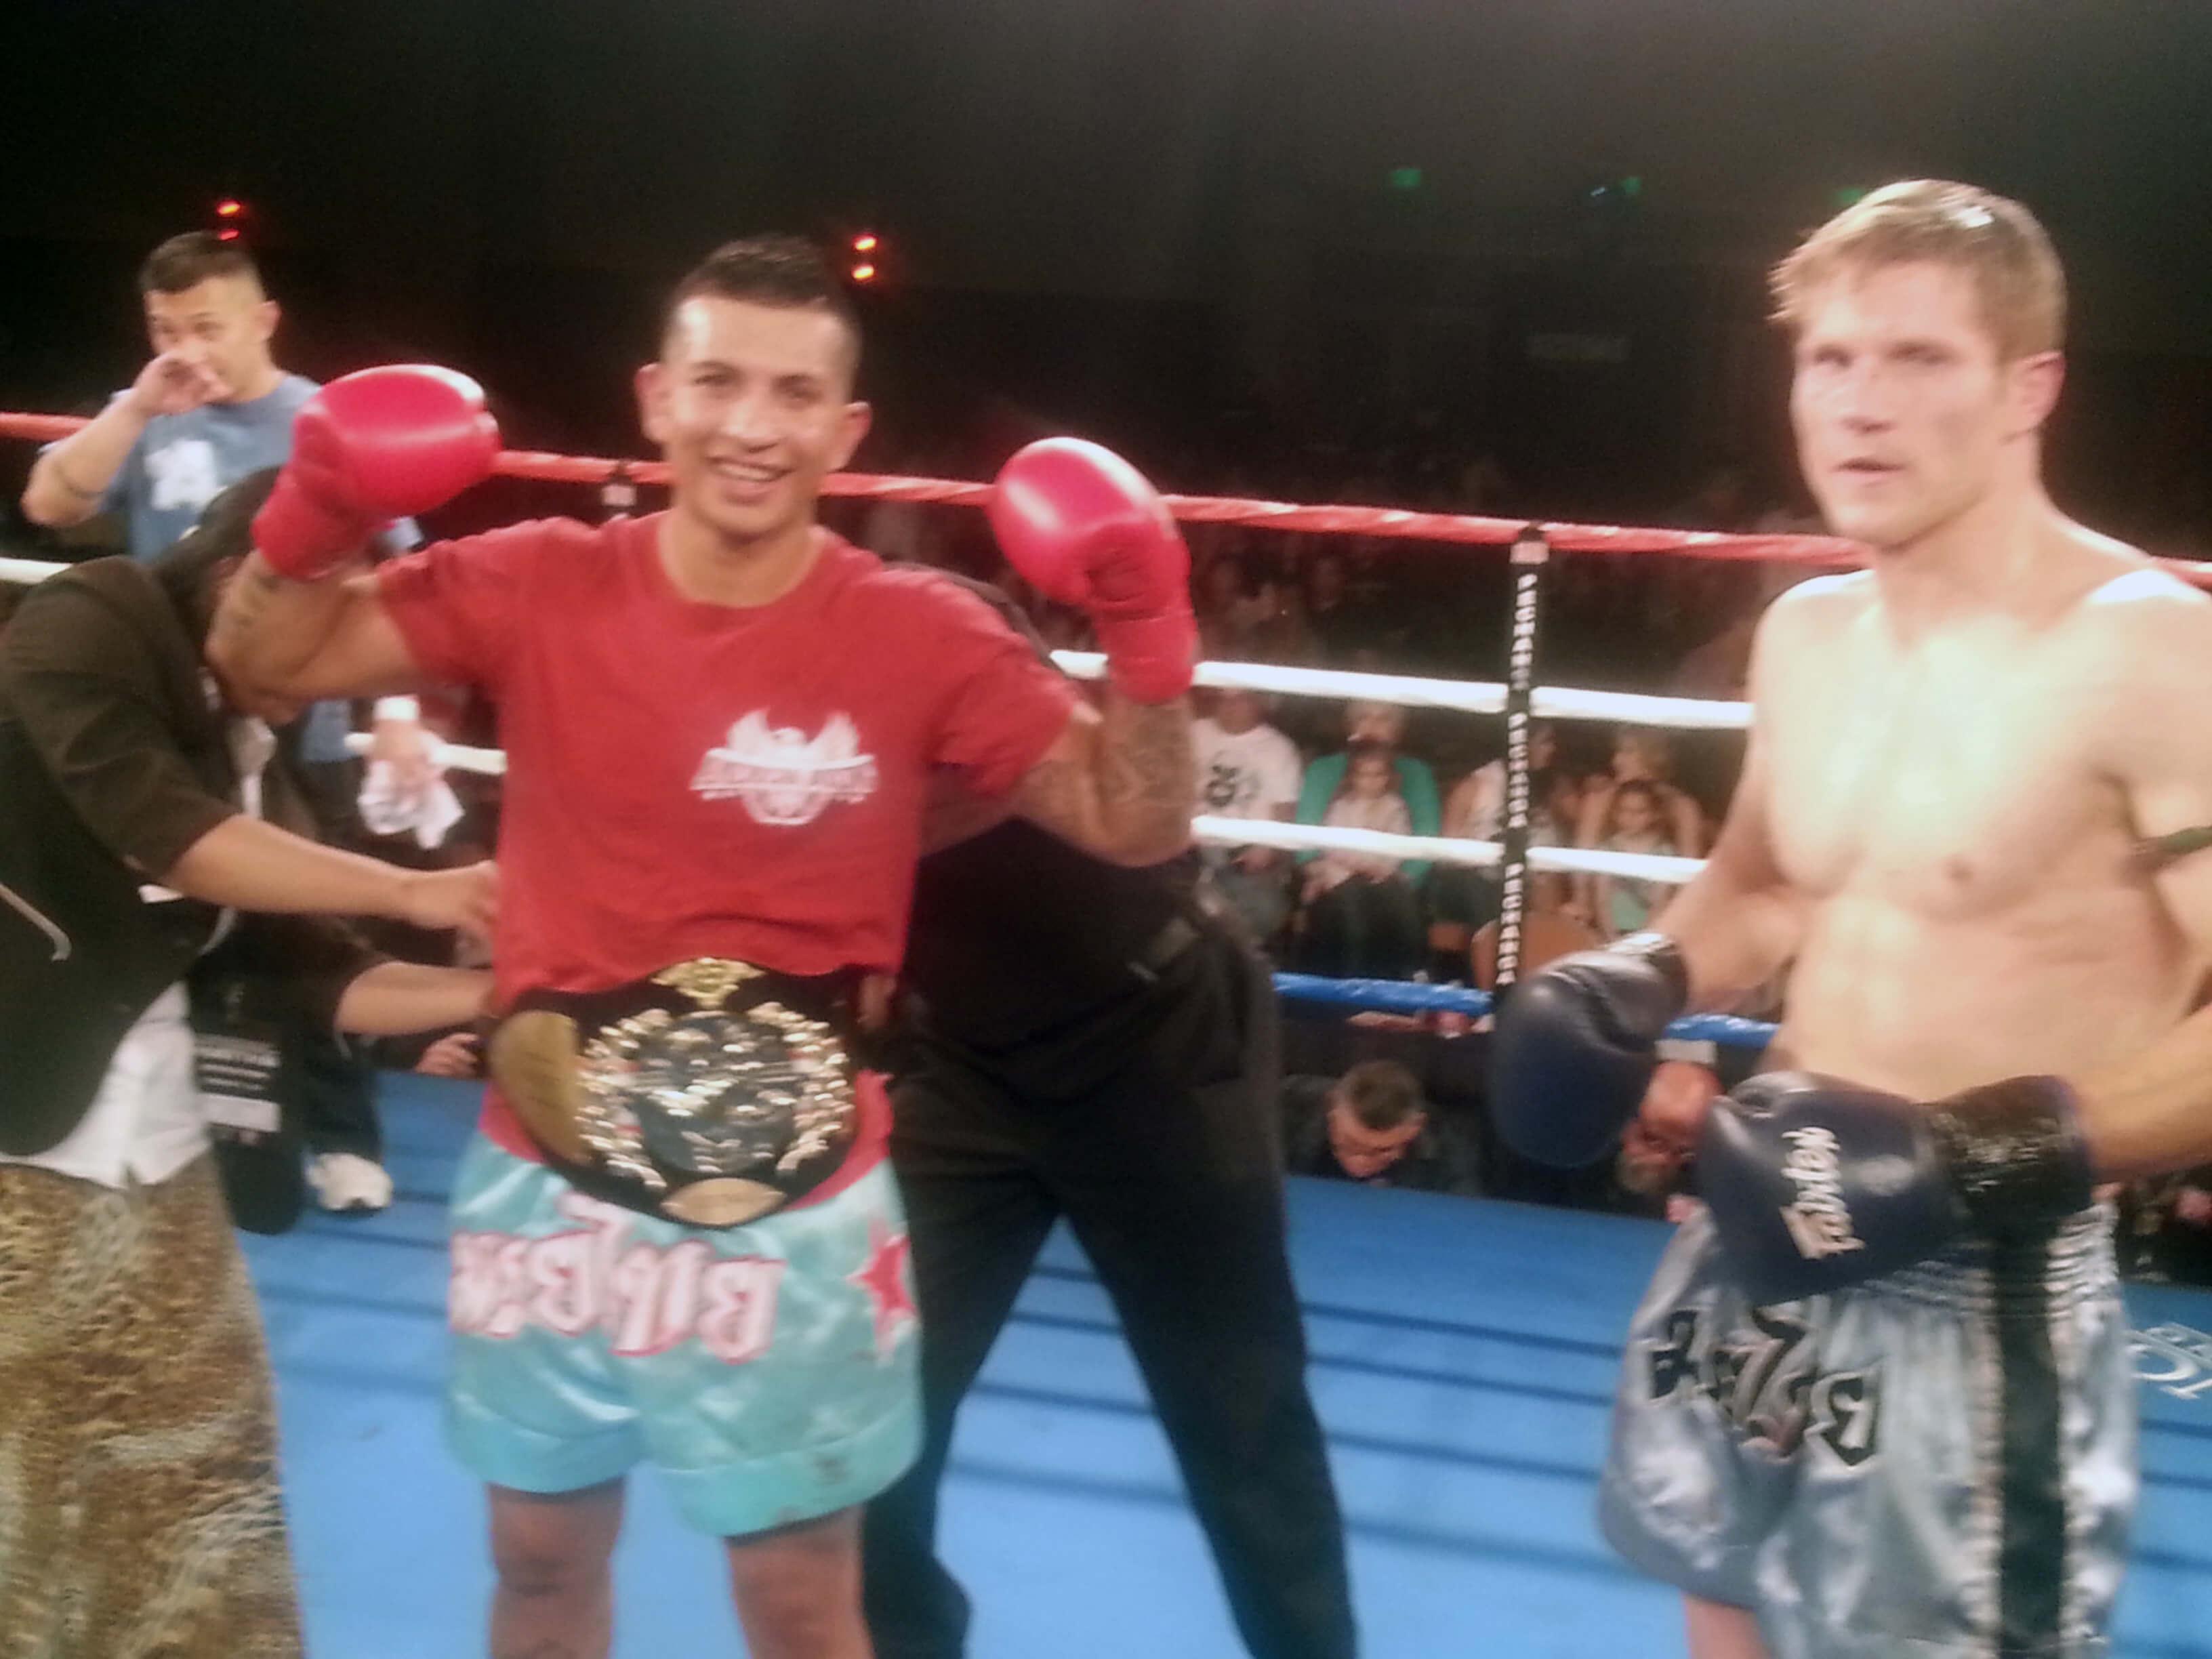 Team Nielsen Fighter Francisco Garcia Muay Thai Champion